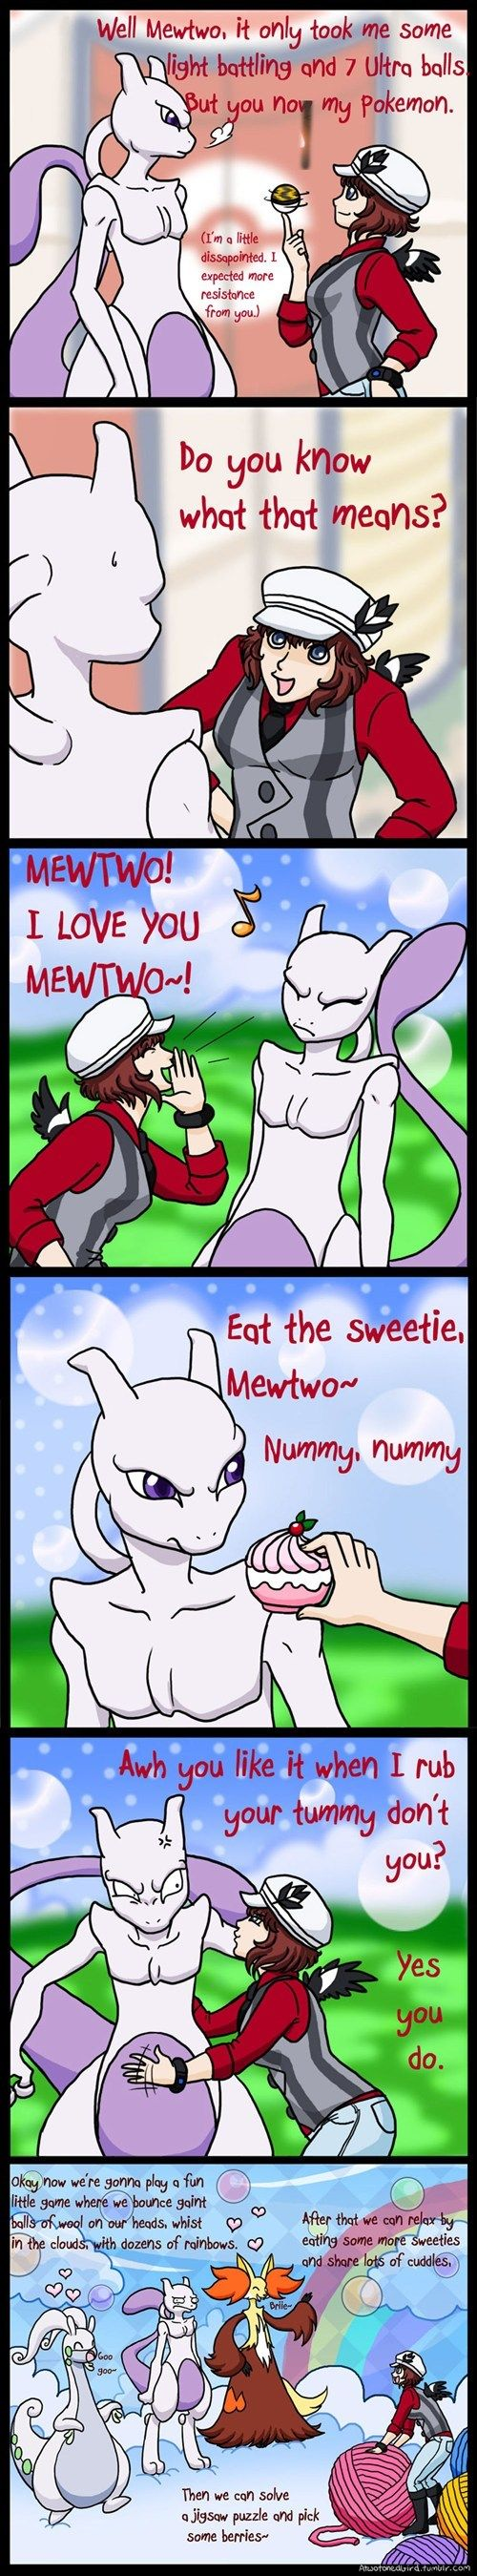 Mewtwo, I Love You!